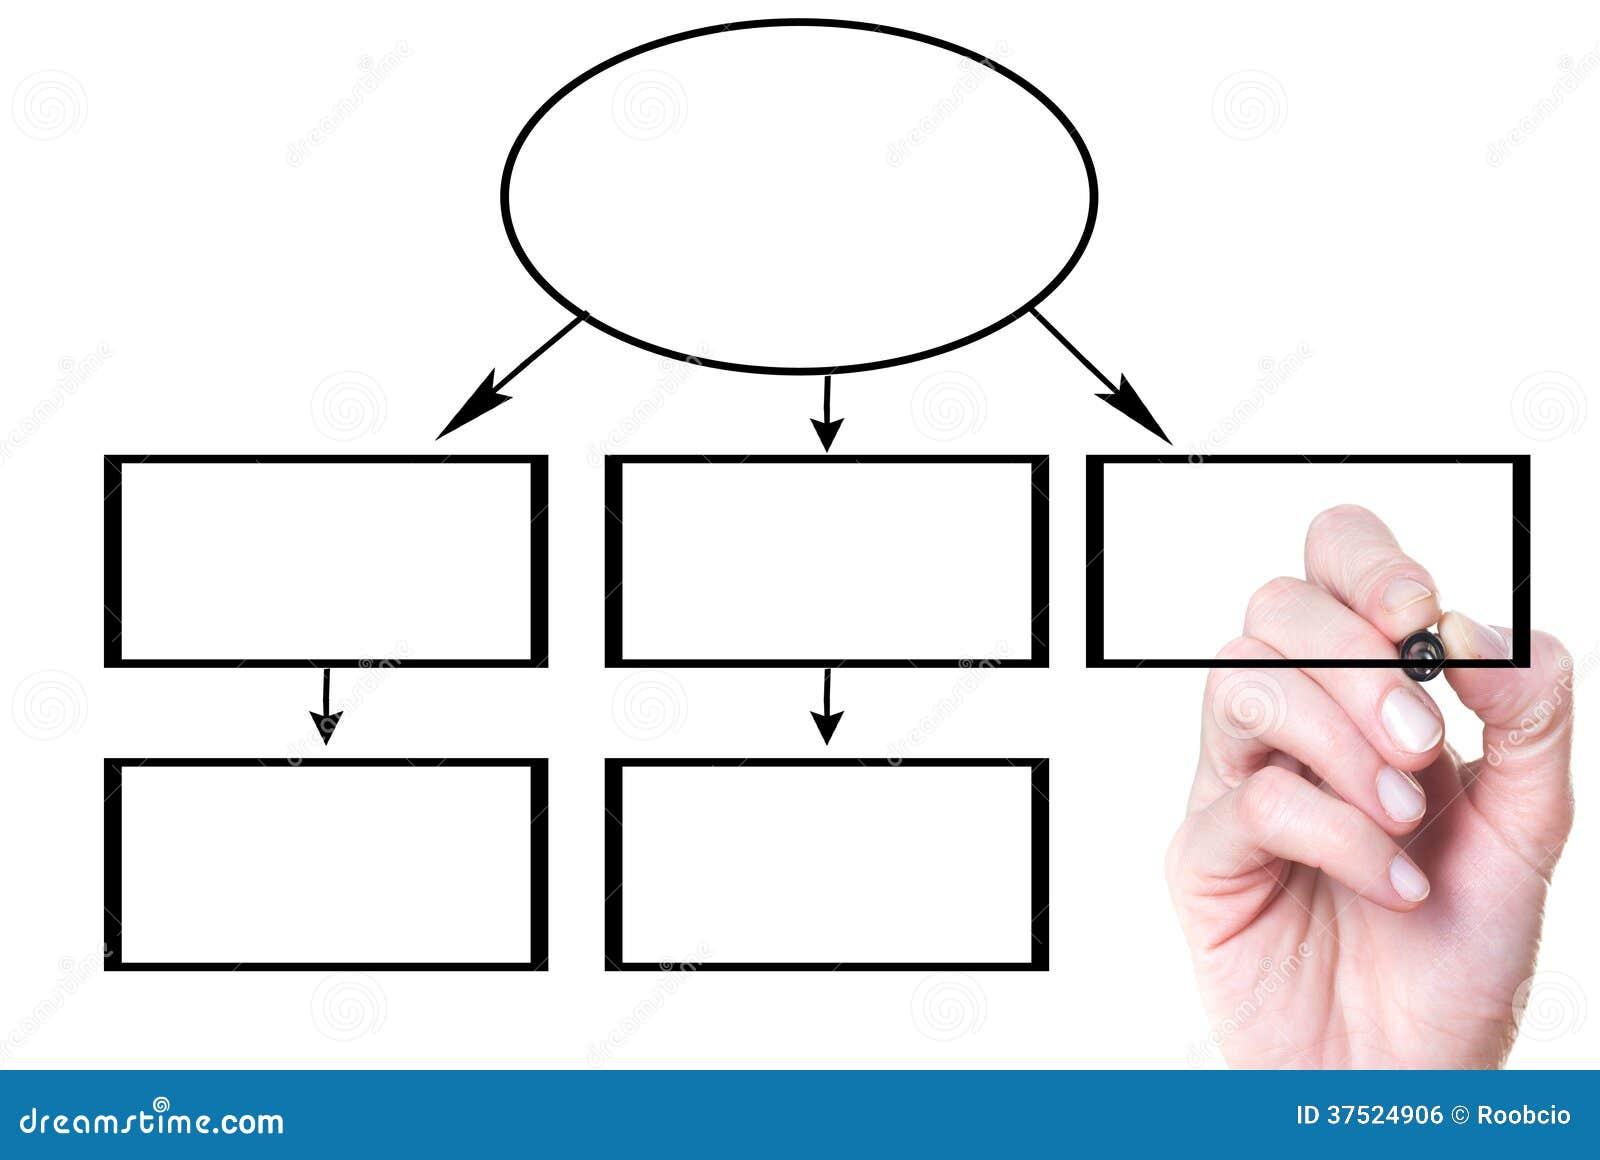 Hand Writing Process Flowchart Diagram Royalty Free Stock